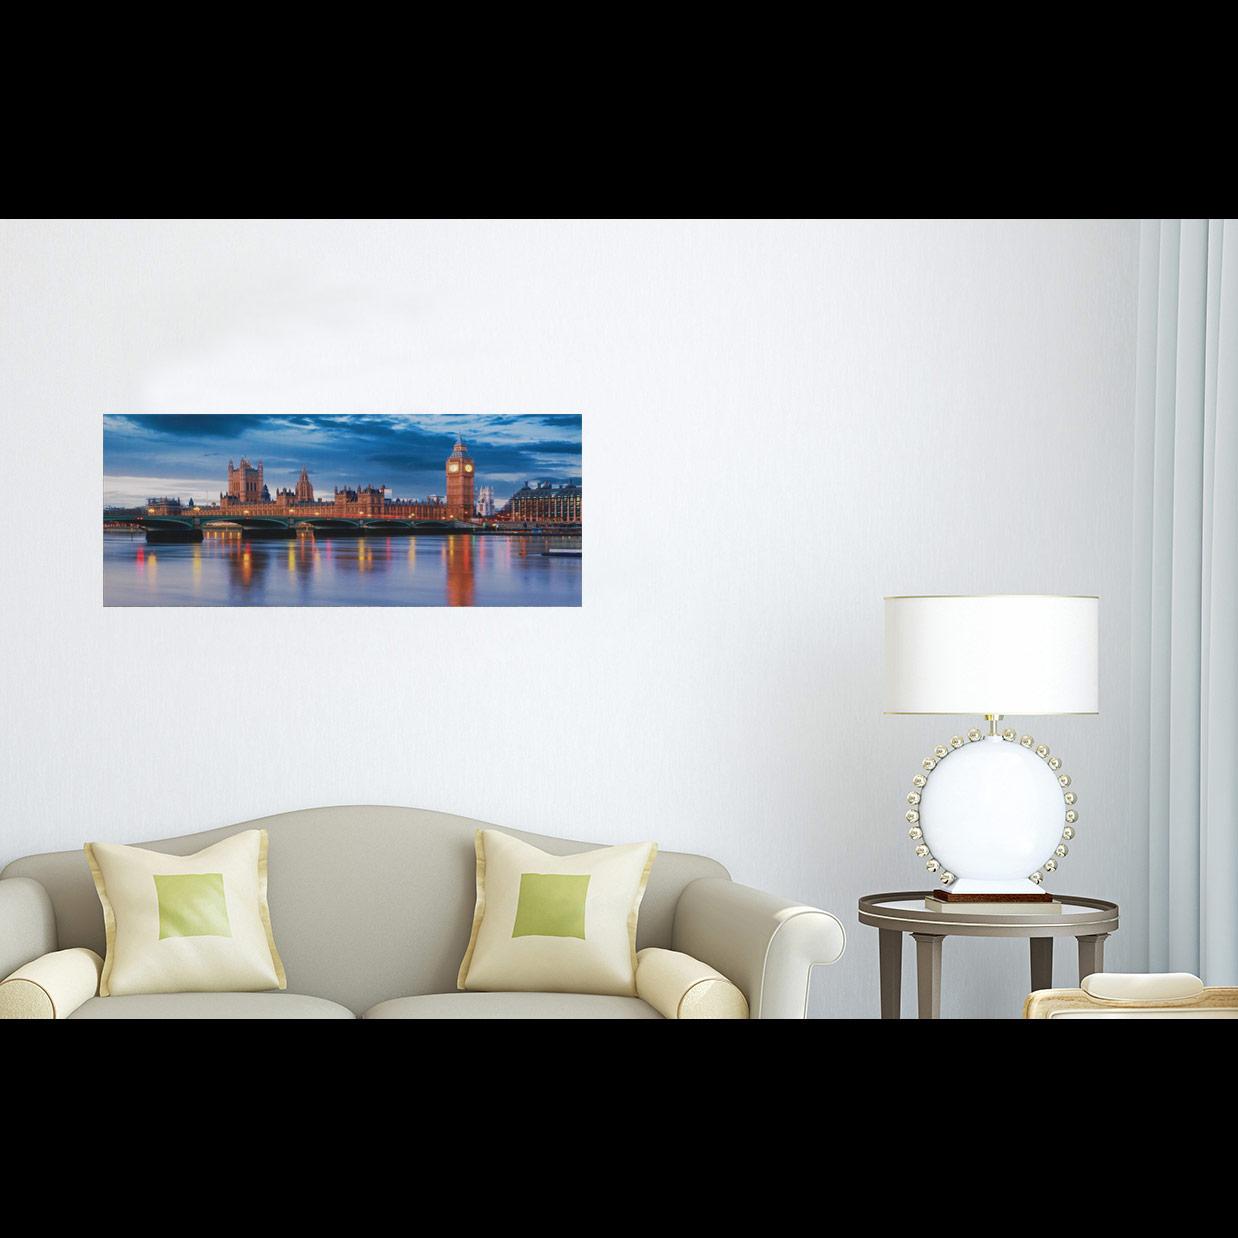 led wandbild leinwand wandbilder xxl leucht bild. Black Bedroom Furniture Sets. Home Design Ideas